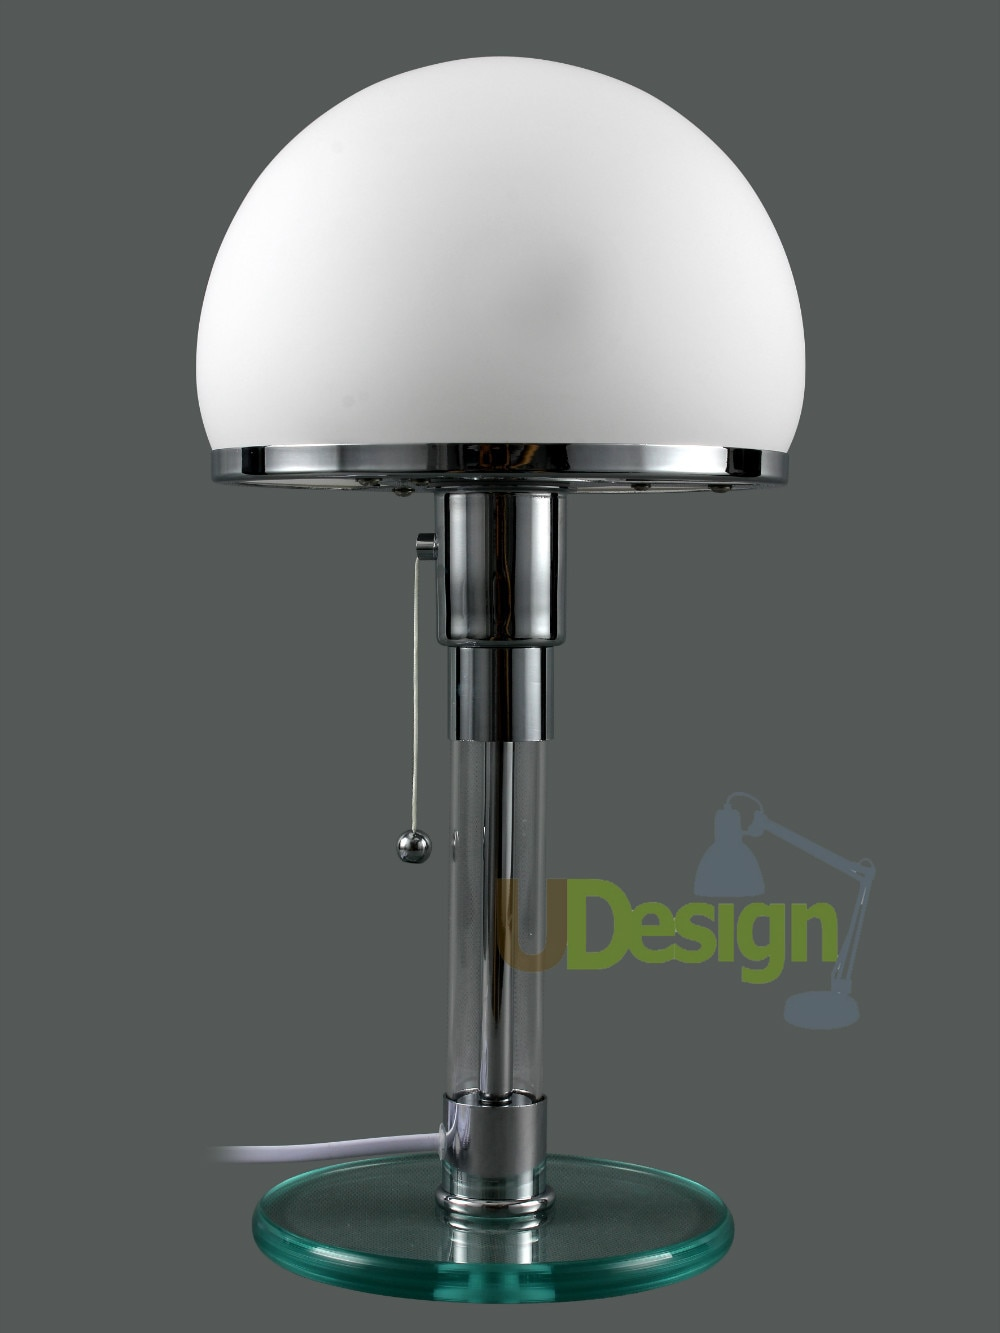 Replica Bauhaus lamp Wilhelm Wagenfeld table lamp -Bauhaus lamp